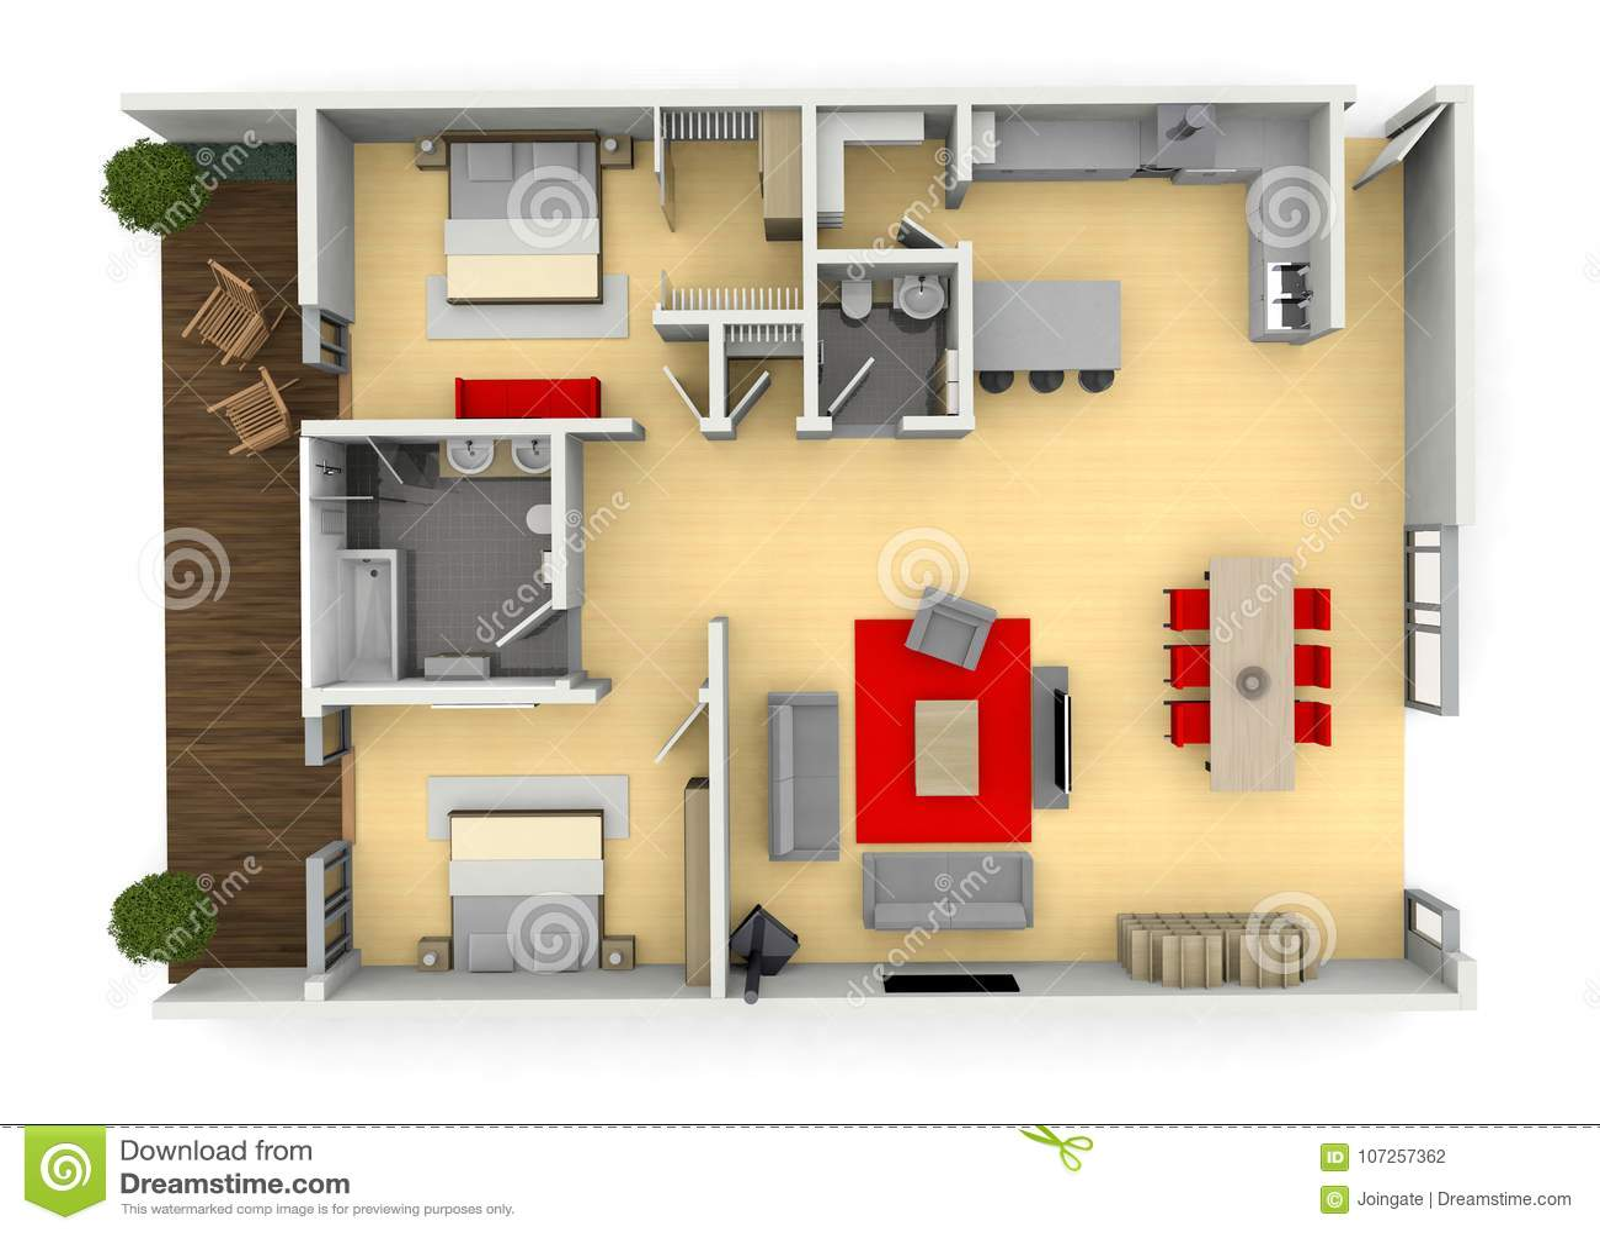 3d Cgi Birds Eye View Floorplan Of A Modern House Stock Illustration Illustration Of Colour Floorplan 107257362